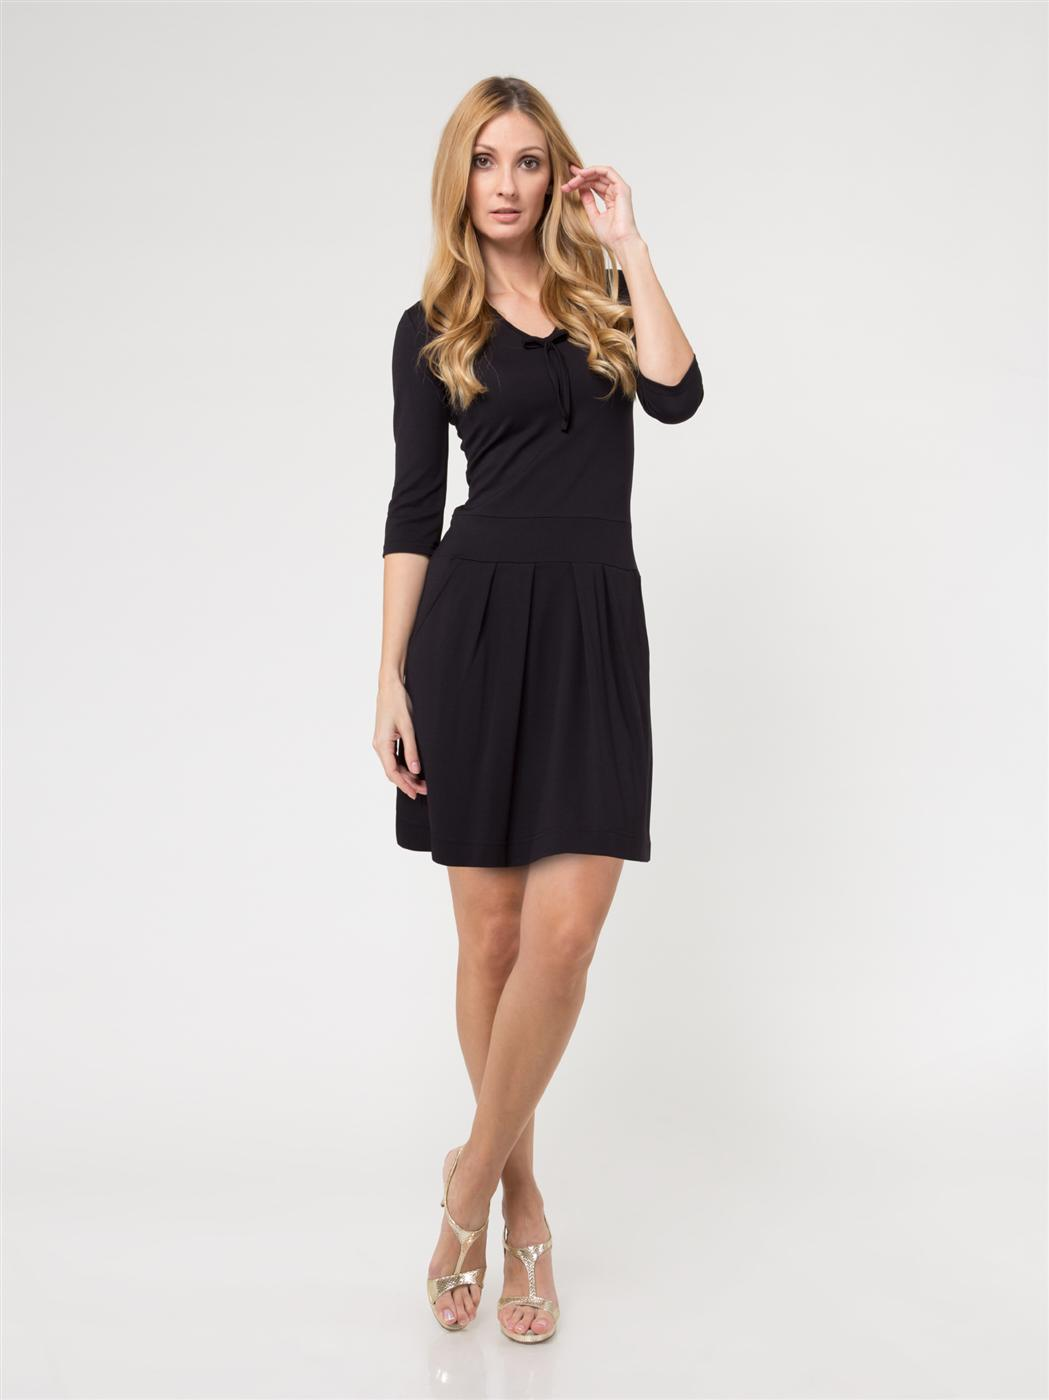 Schwarzes Kleid YY17